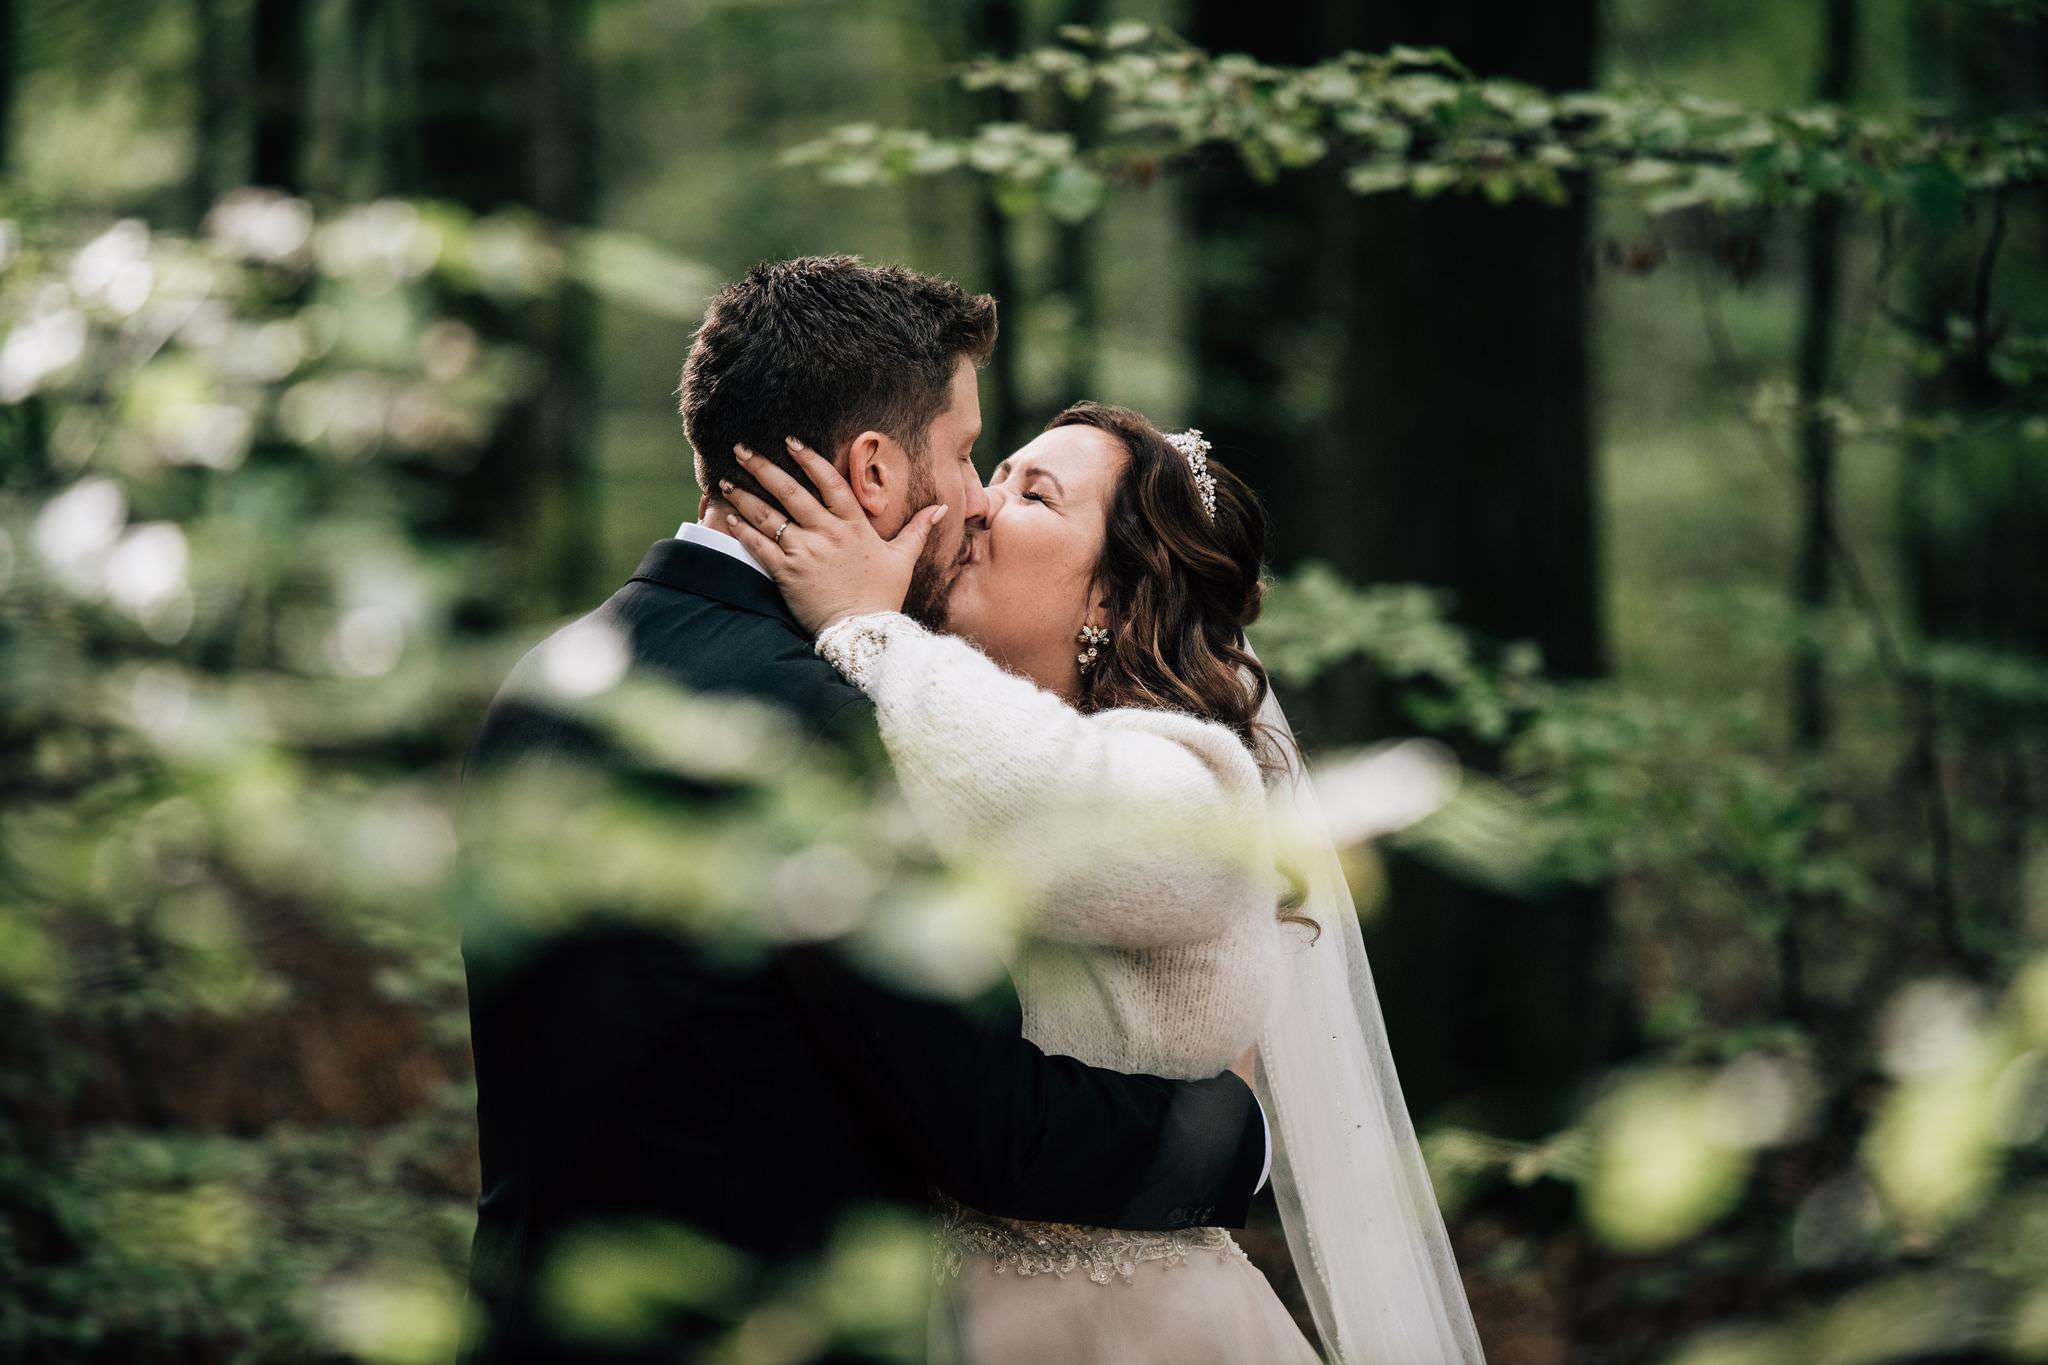 _N857837_fotografering_larvik_bryllup_aspargesgarden_.jpg